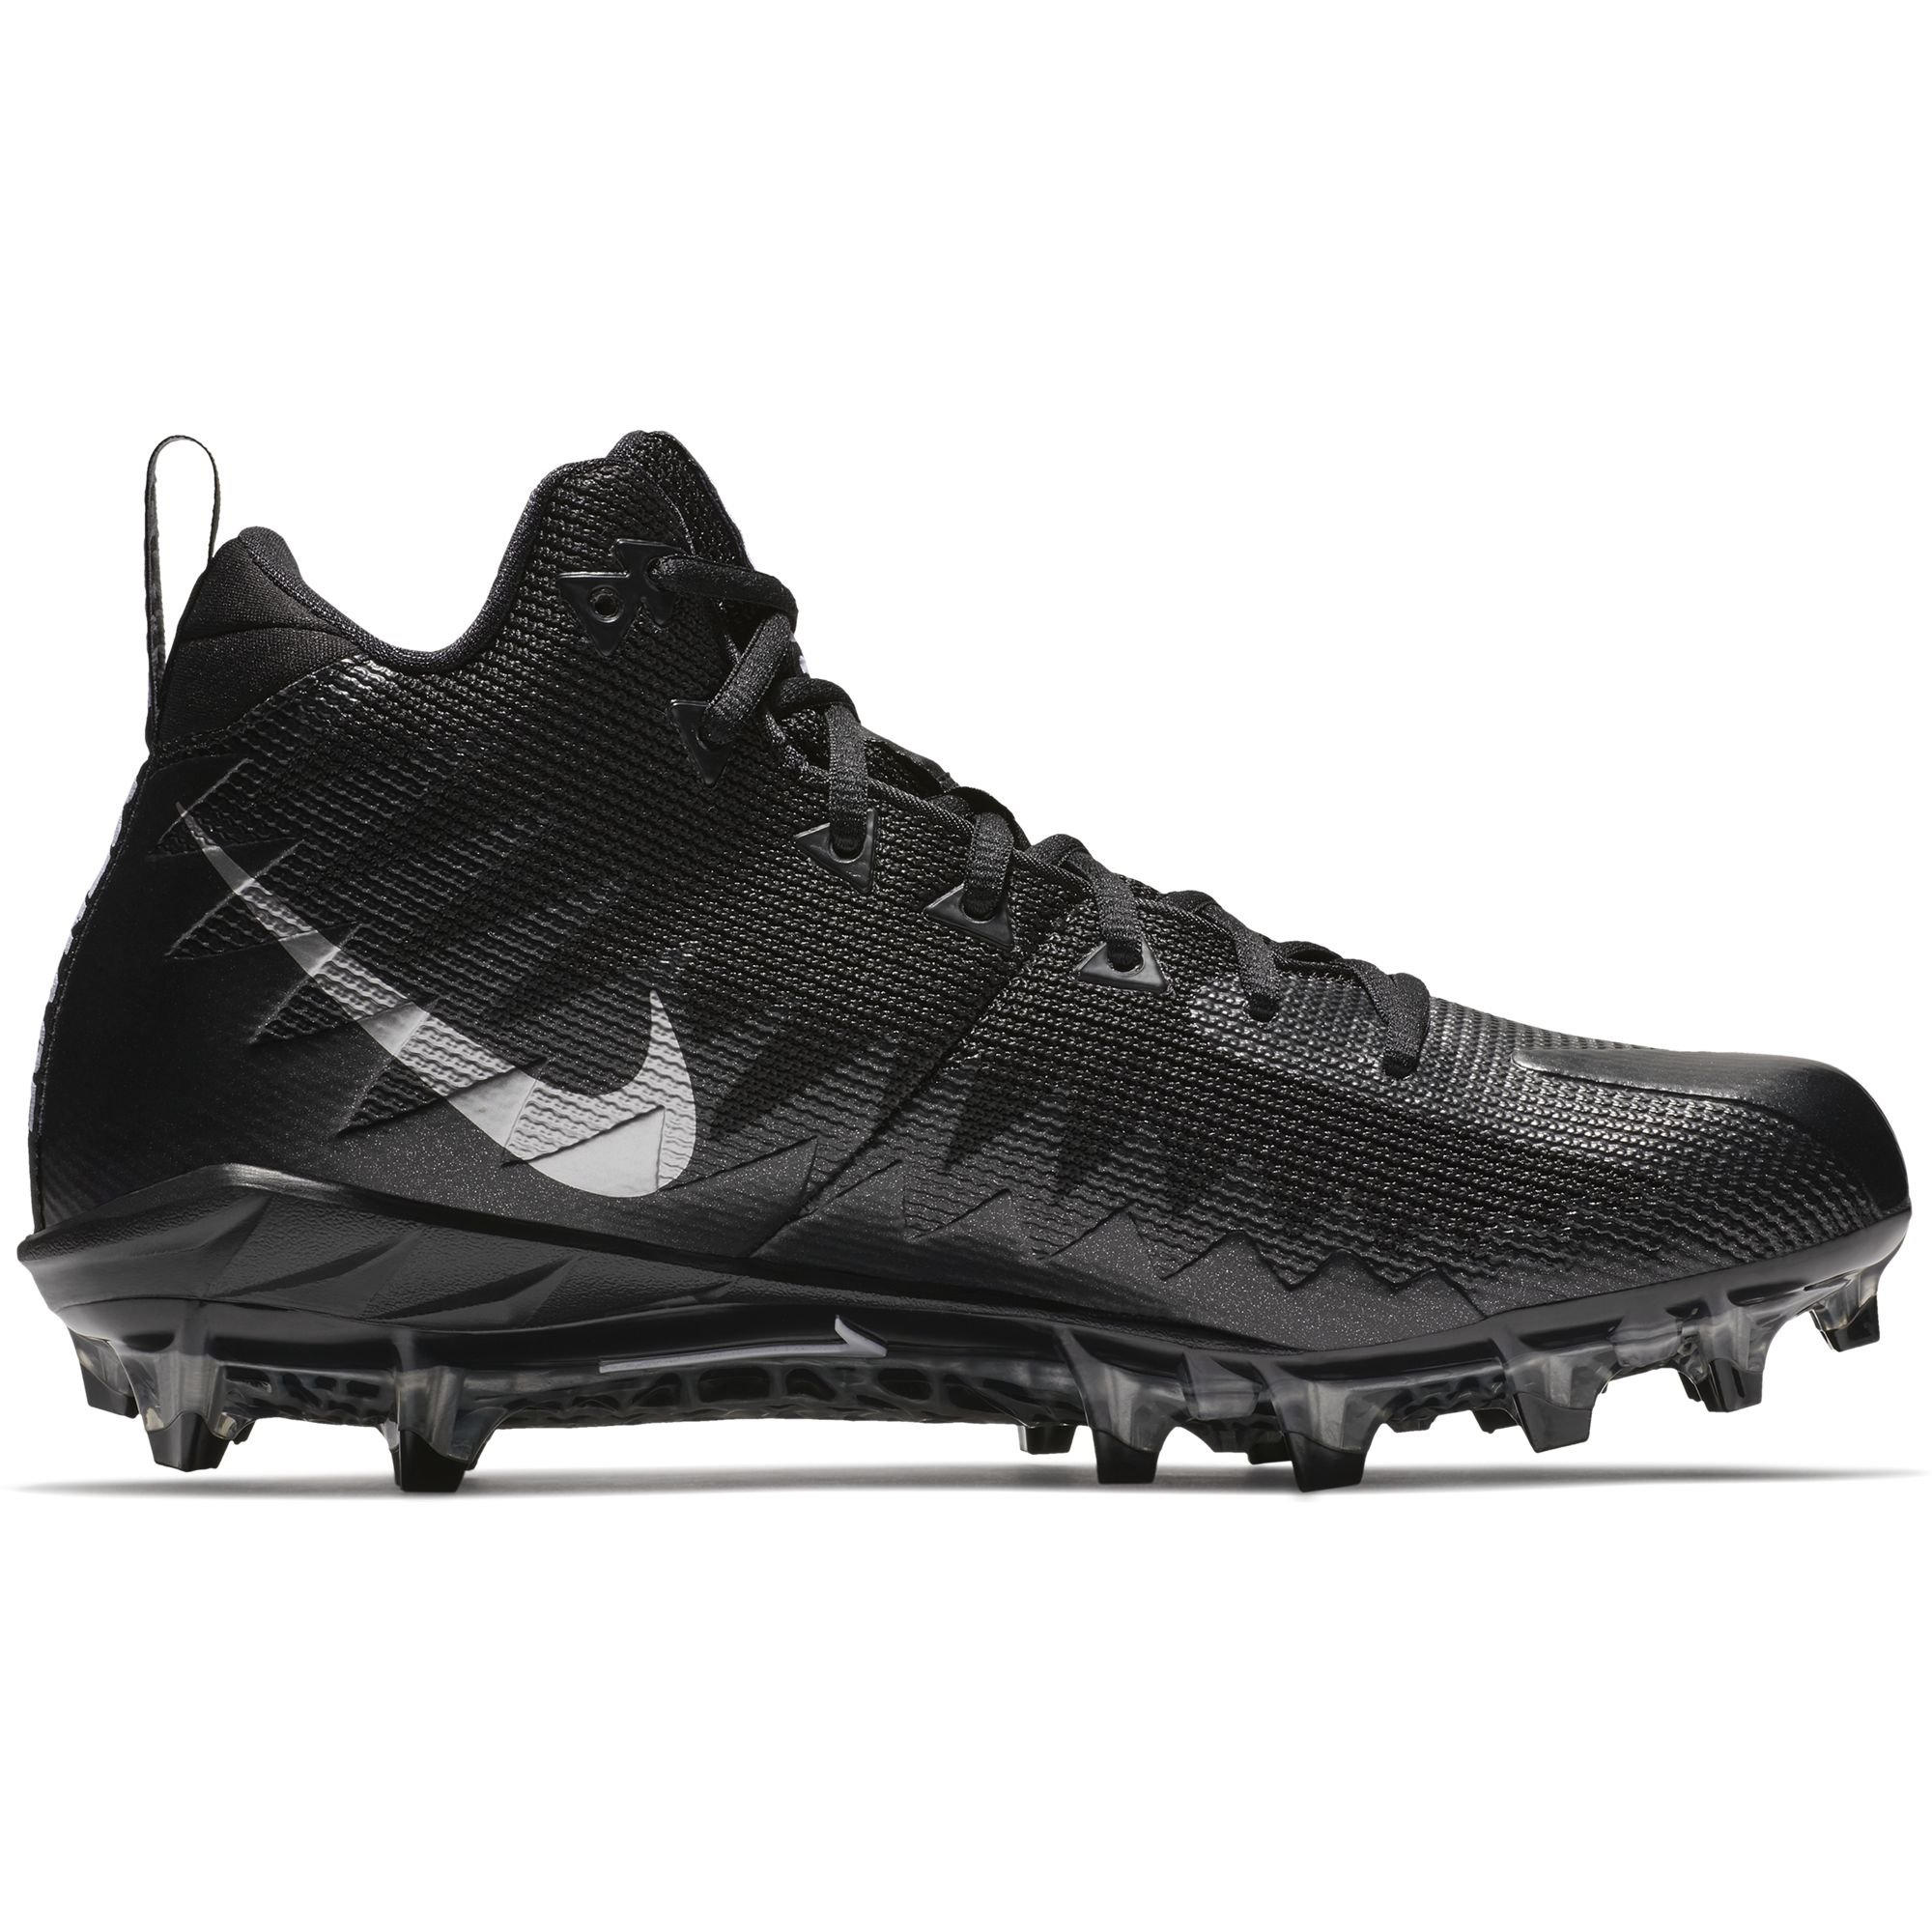 the best attitude bf381 7c532 Galleon - Nike Mens Alpha Menace Pro Mid Football Cleat BlackMetallic  Silver Size 10.5 M US